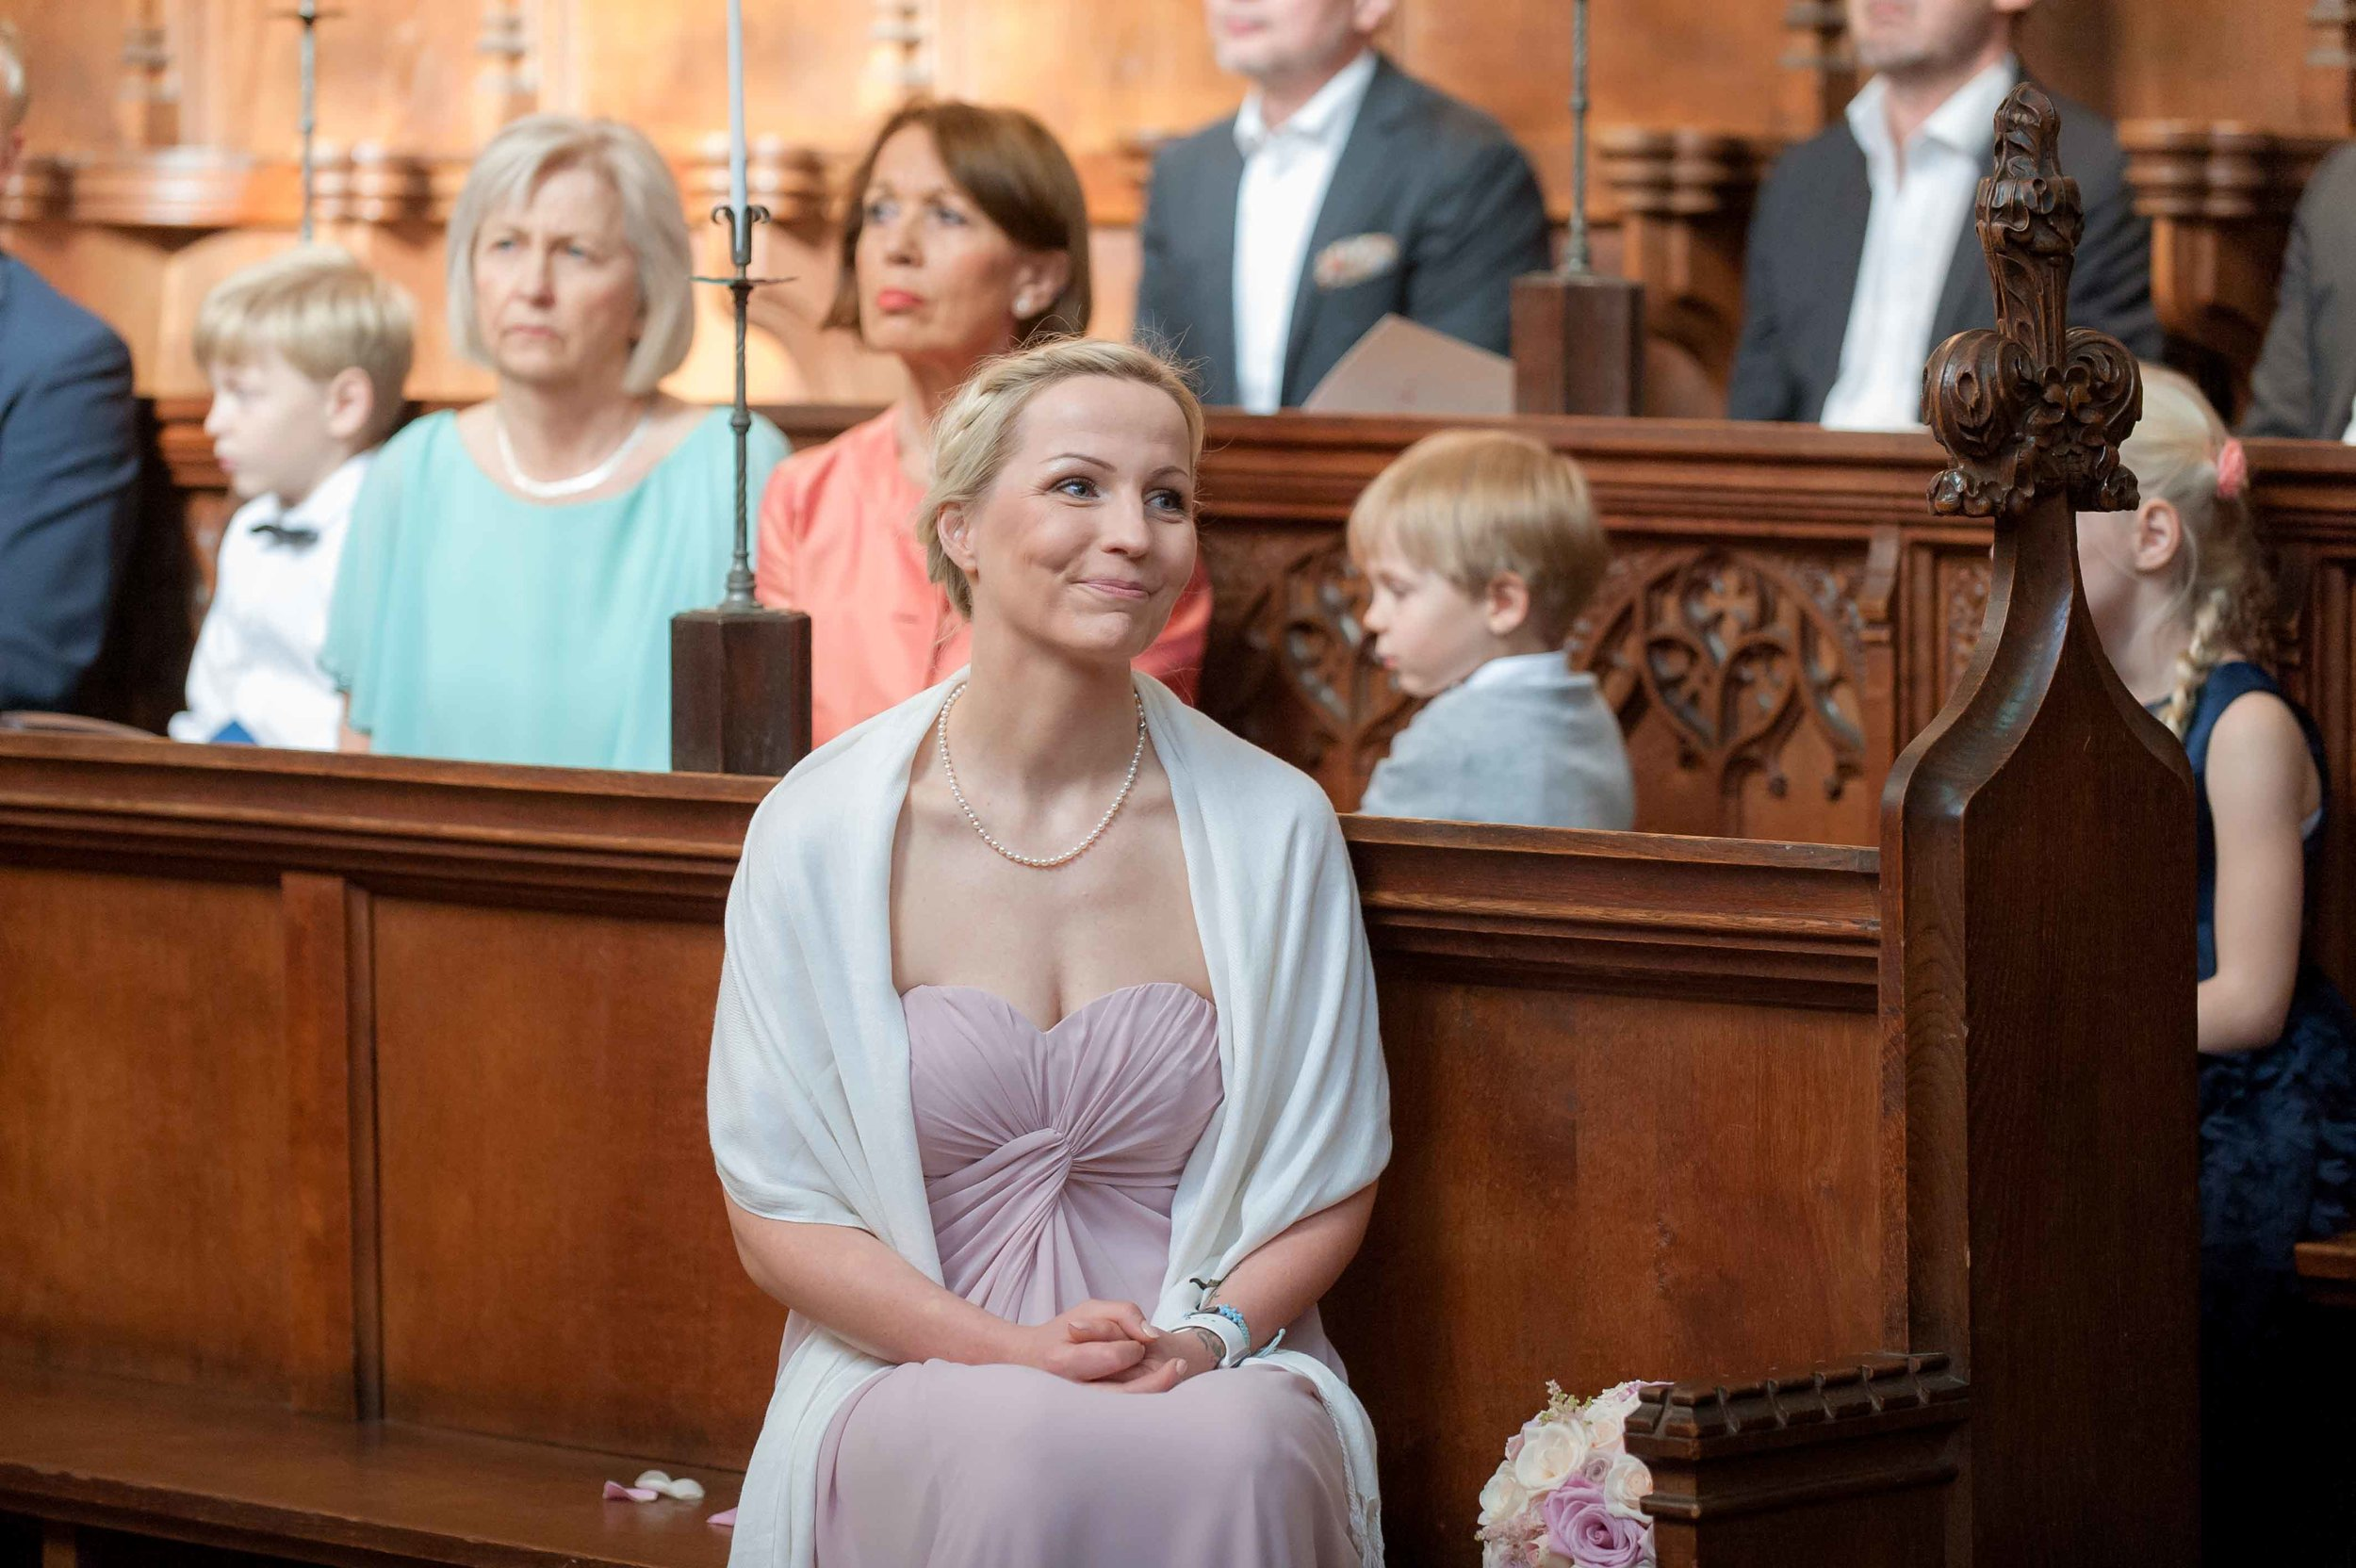 Adrian_Nicole_Charnwood_Weddings_Queens_College_Cambridge-1019.jpg